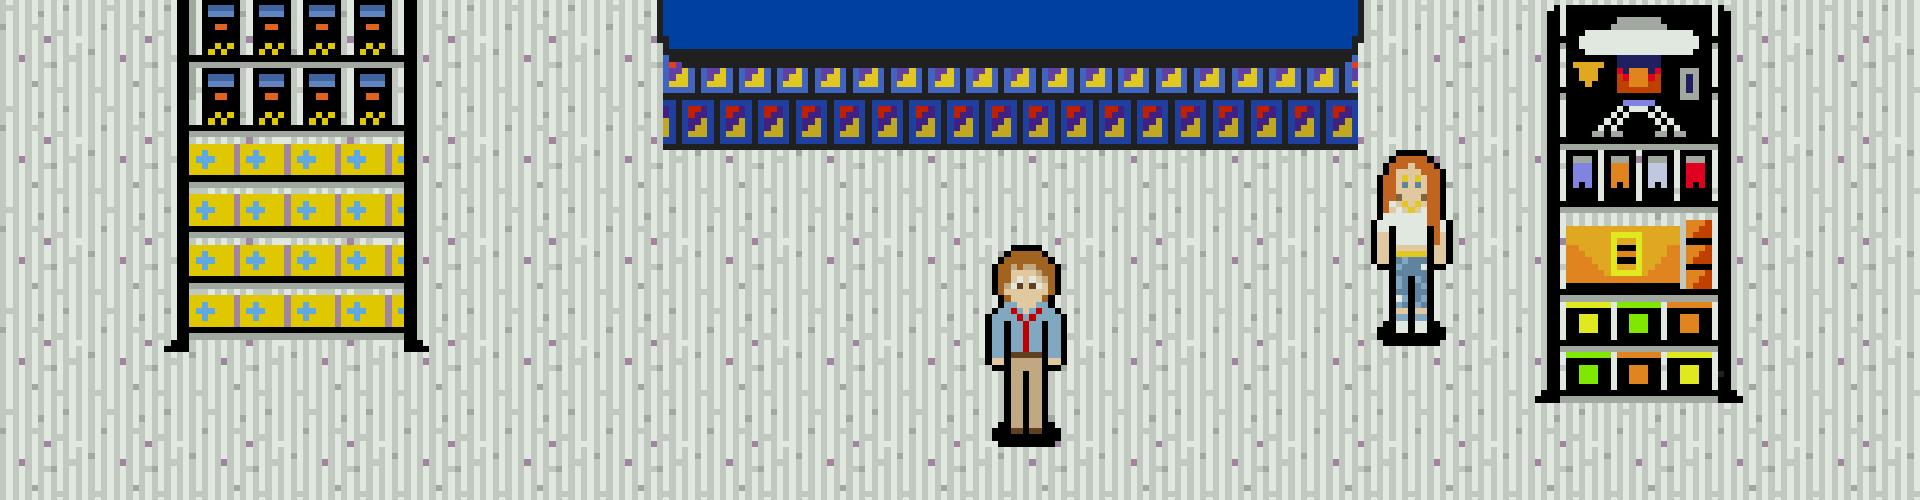 Retail Clerk '89